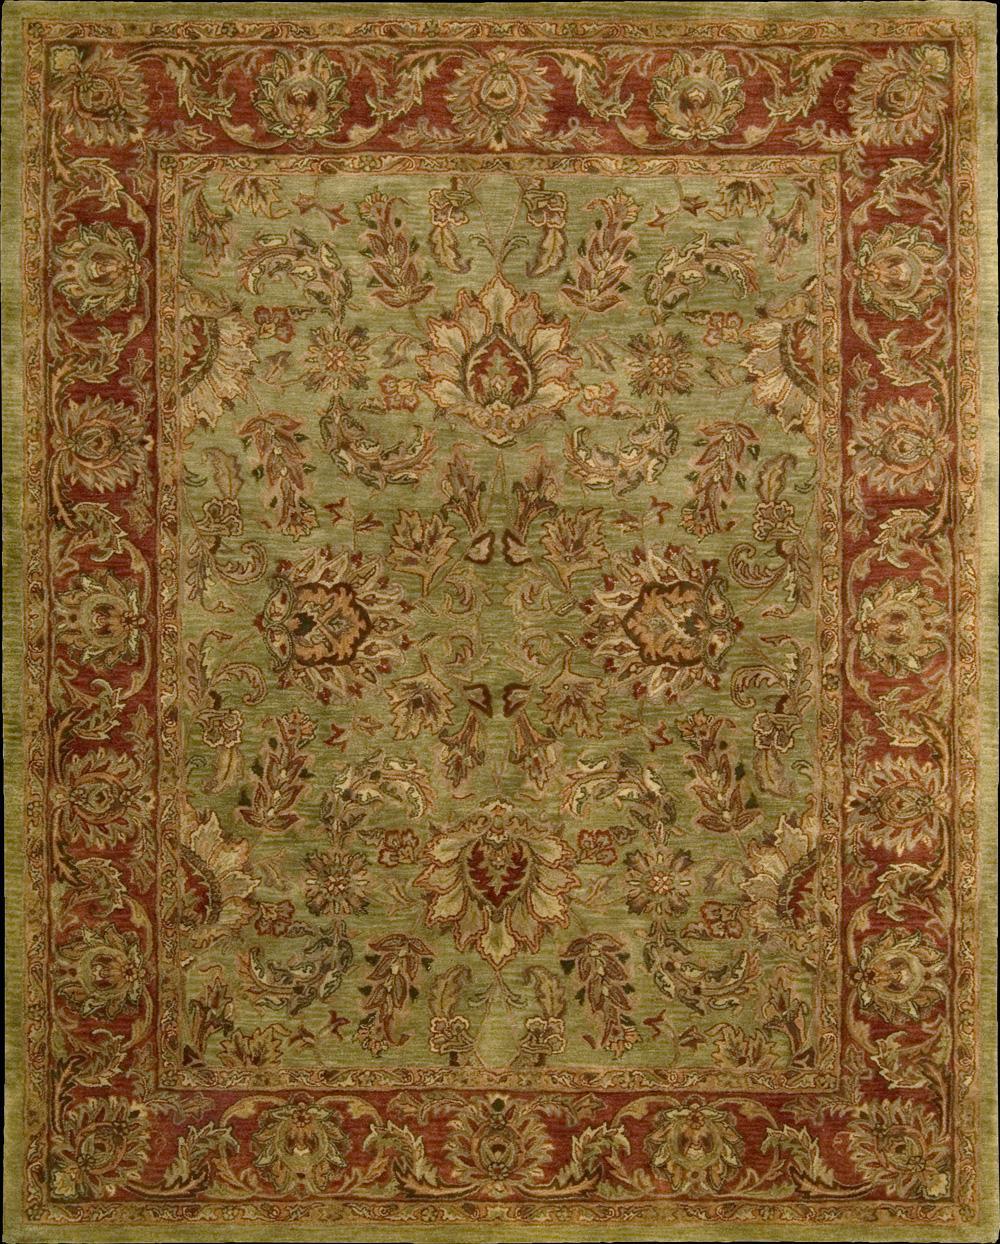 "Nourison Jaipur Area Rug 3'9"" x 5'9"" - Item Number: 30059"